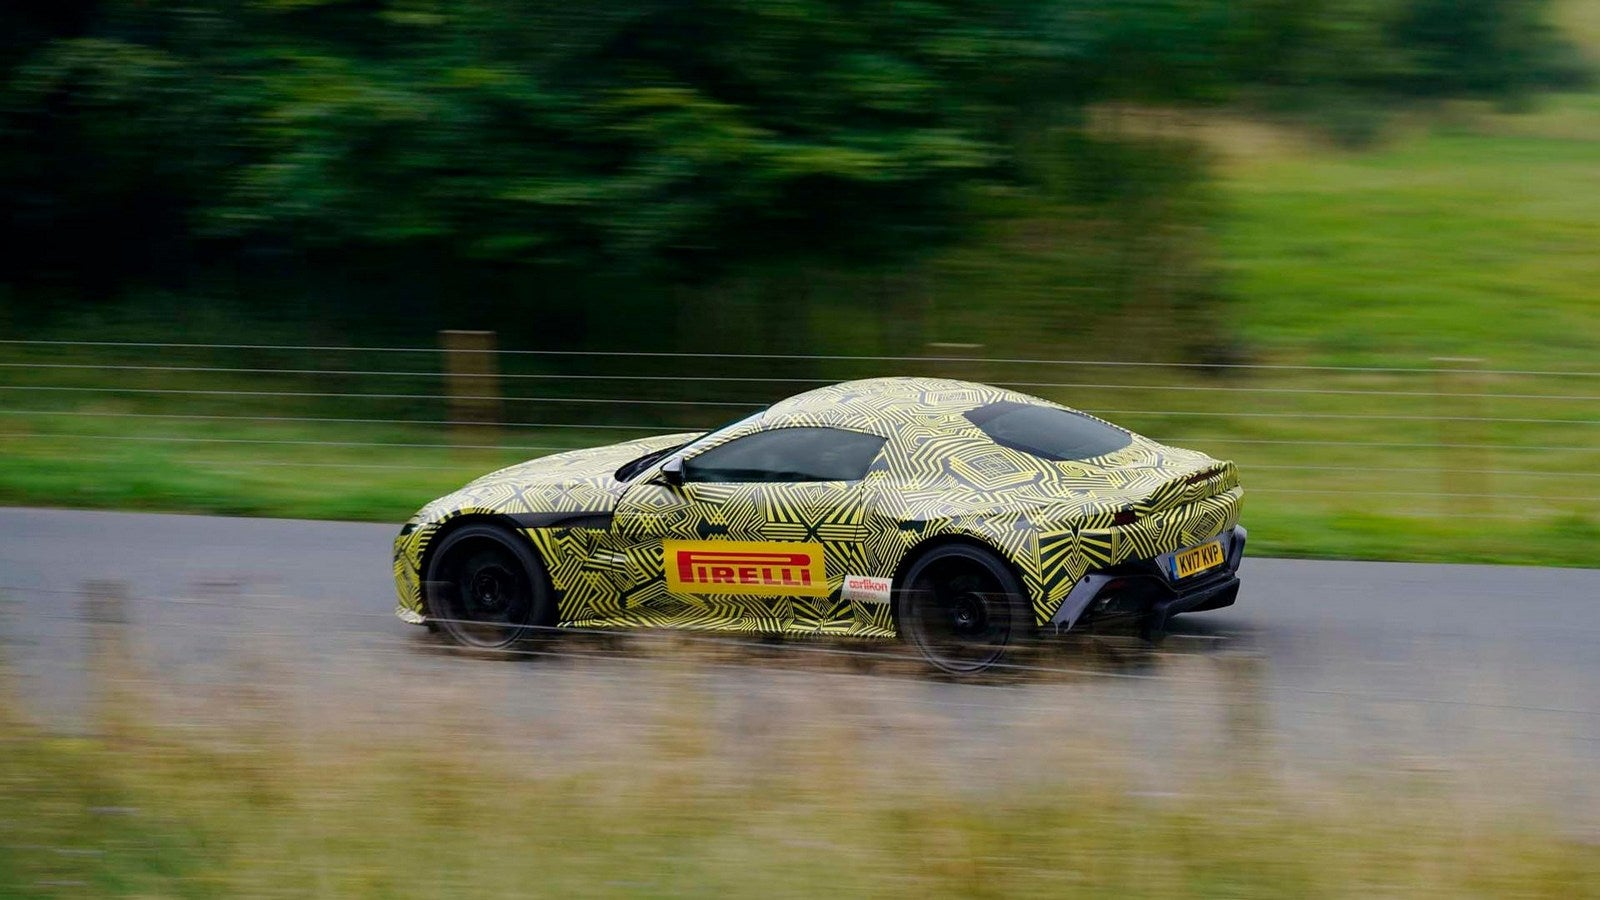 Aston Martin Is Finally Going To Build James Bond's DB10 As The Next Vantage